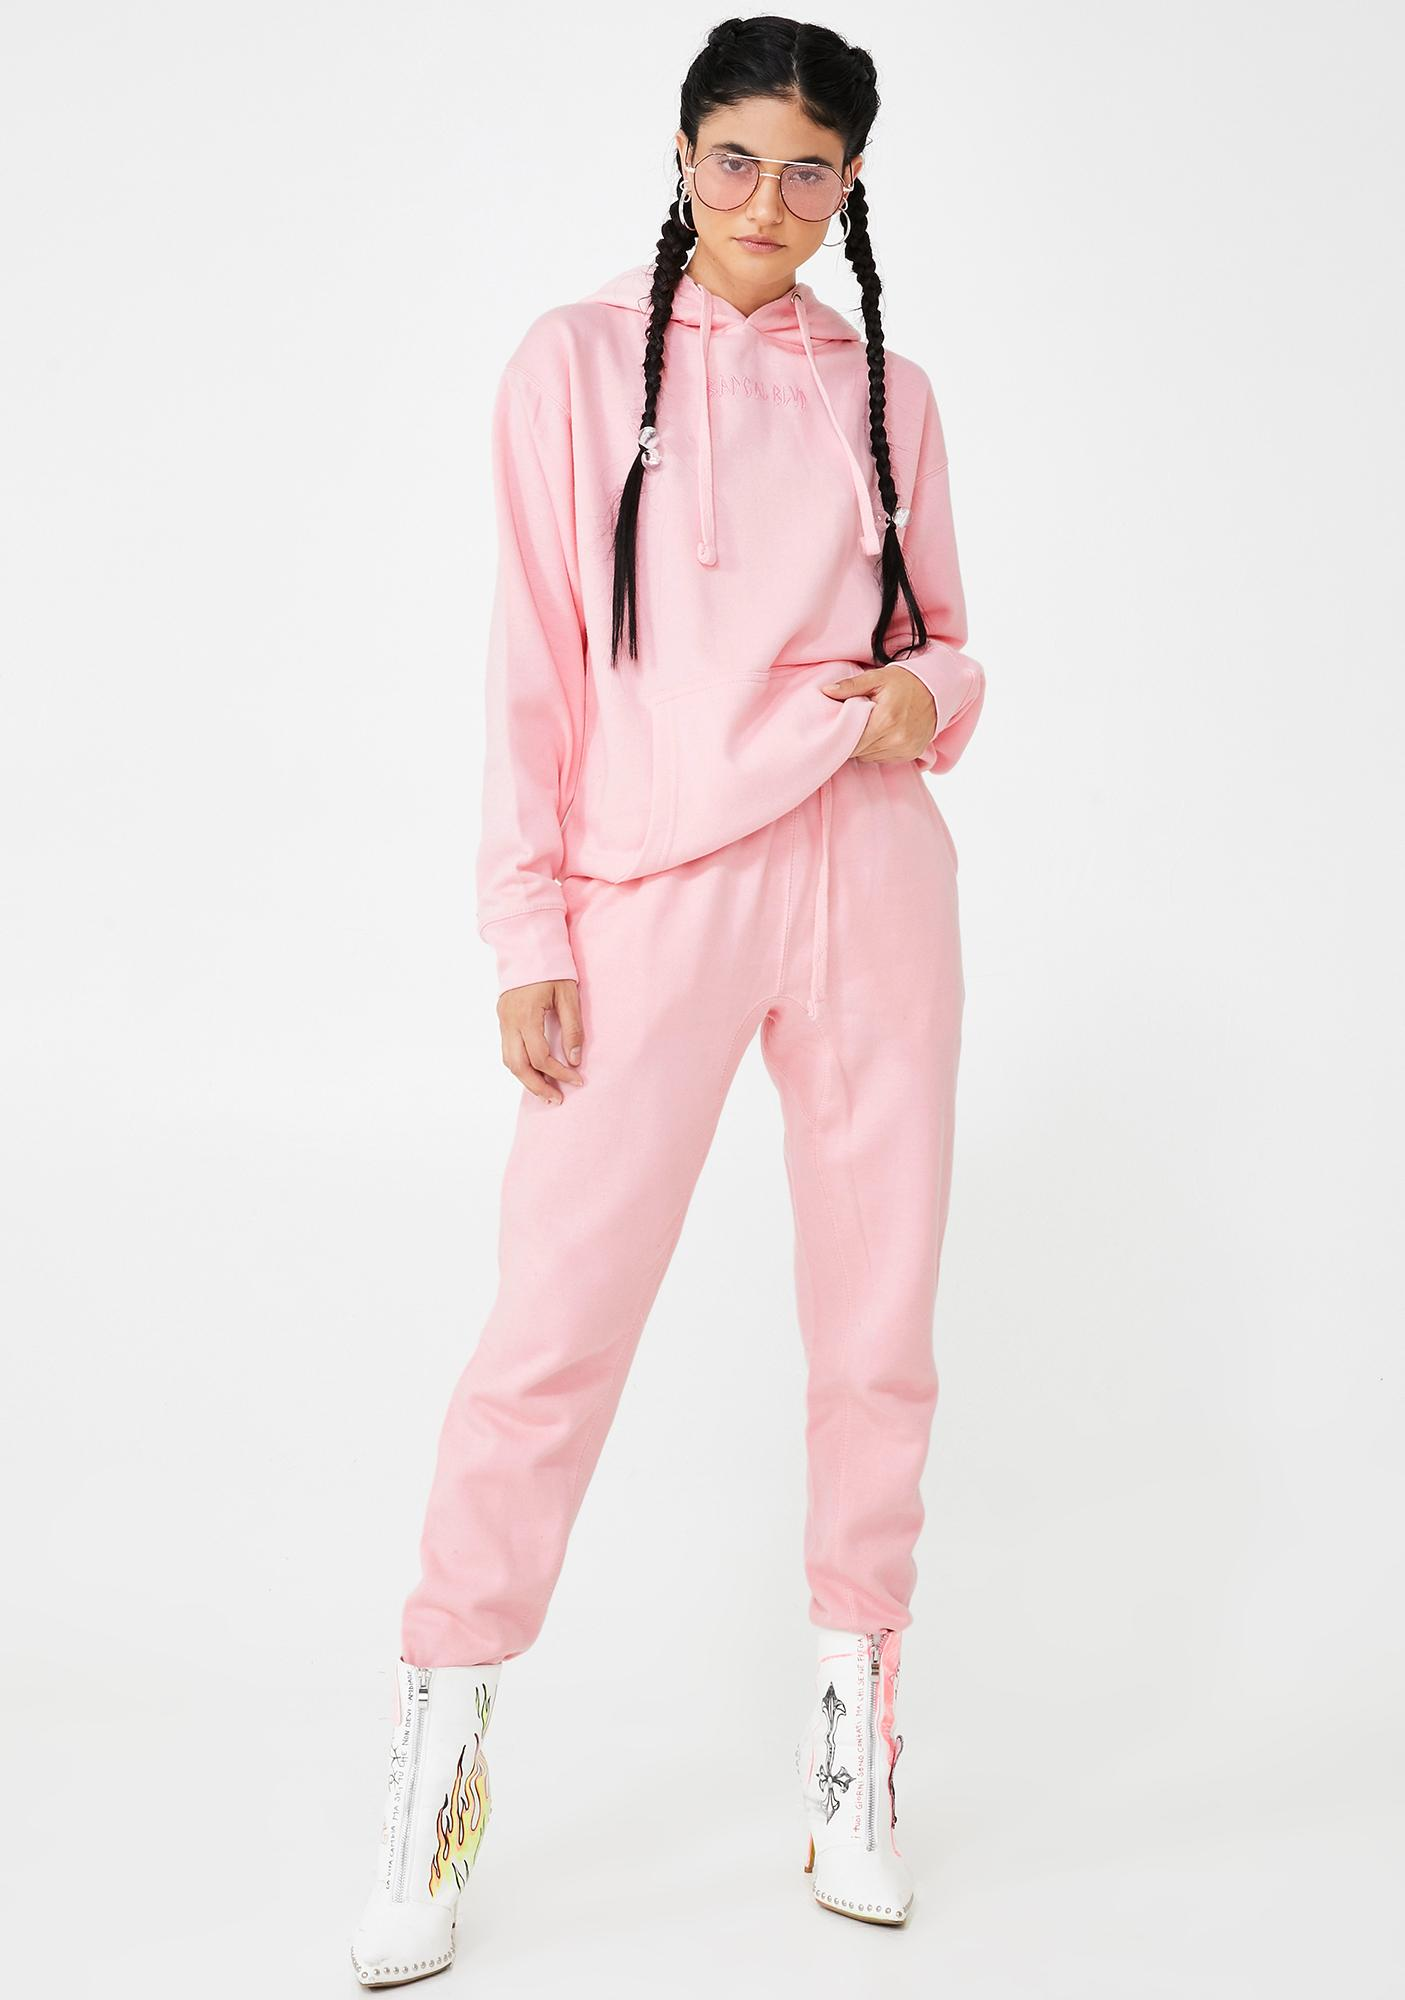 BADGAL BLVD Baby Pink Jogger Set